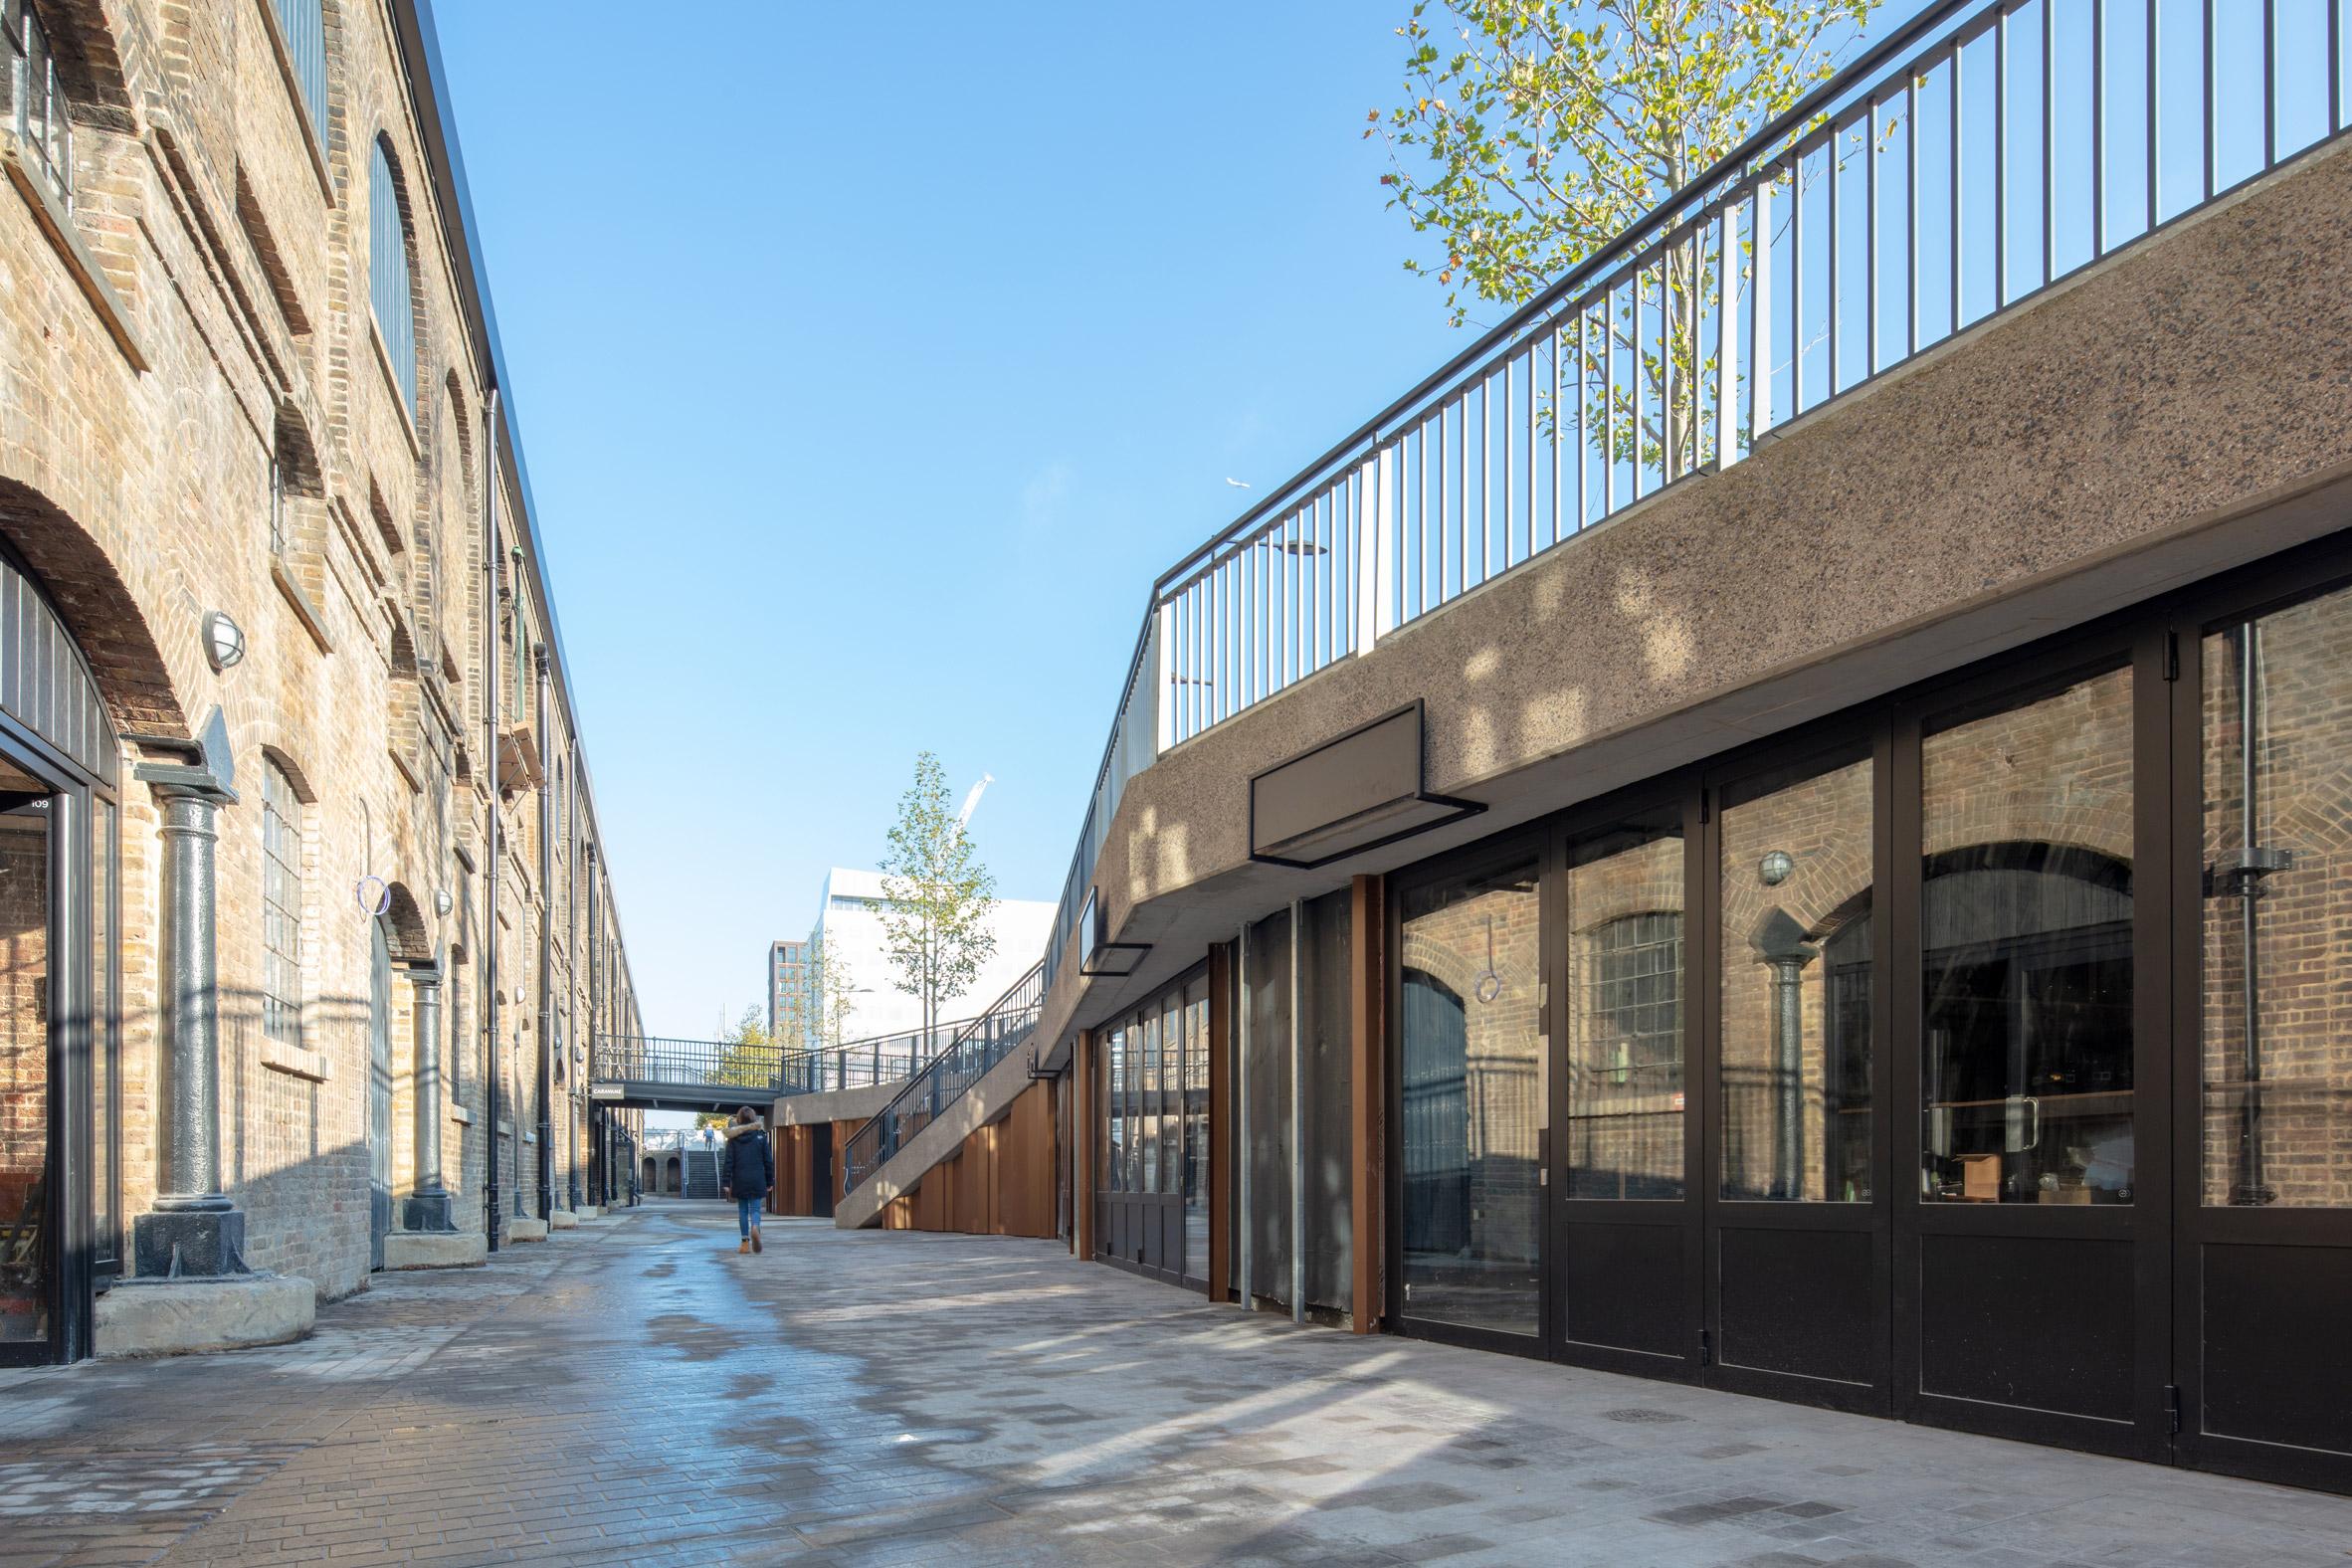 coal-drops-yard-thomas-heatherwick-studio-kings-cross-architecture_dezeen_2364_col_6